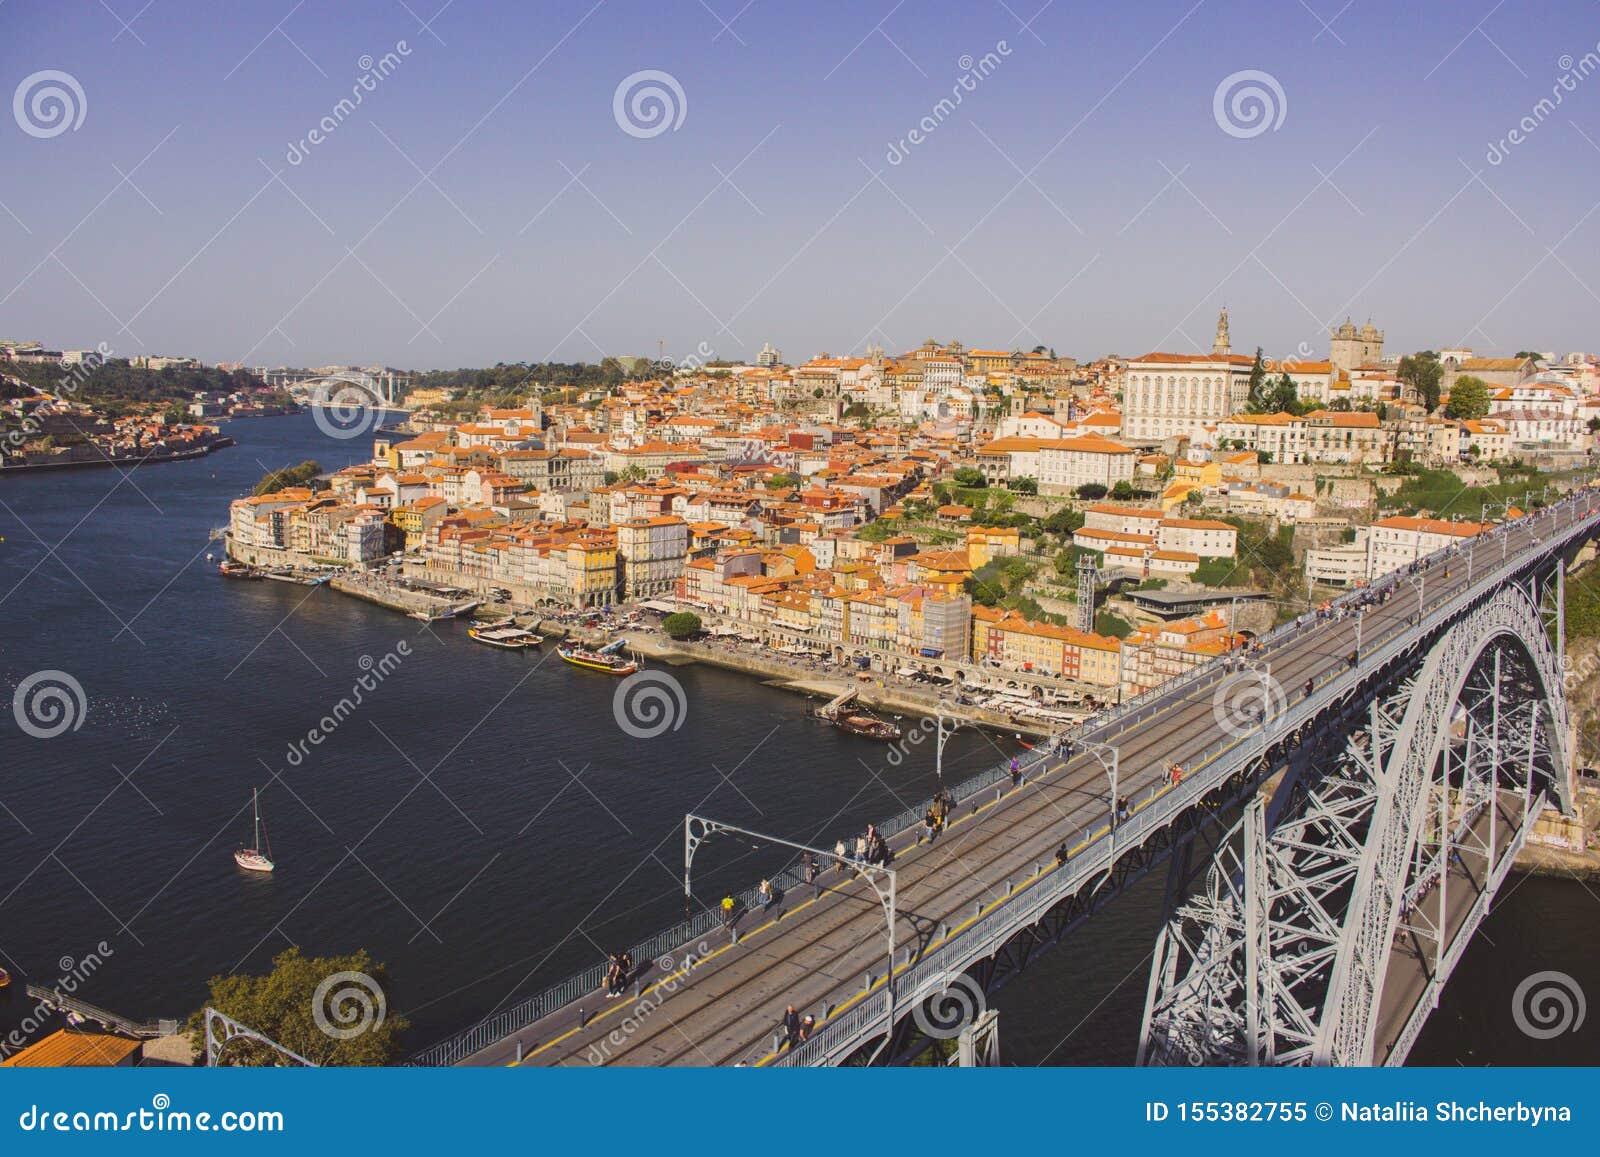 Famous Porto bridge Ponte Luis top view. Porto bridge over river Douro. Portuguese river Douro with metro bridge and tourists.